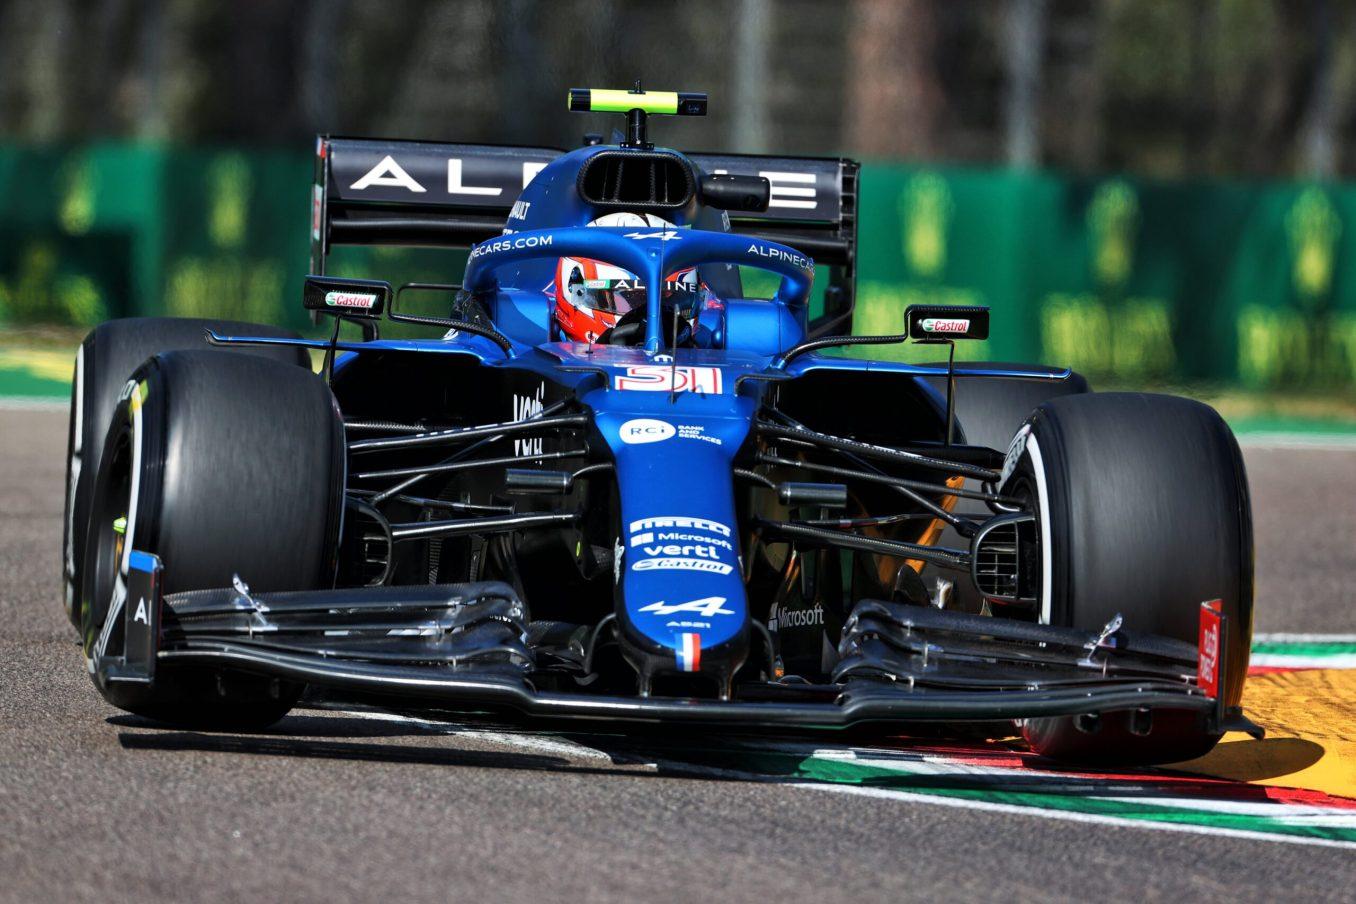 Alpine F1 Team A521 Alonso Ocon Brivio Permane Imola 2021 Test 14 scaled | Alpine F1 Team en milieu de peloton aux essais à Imola